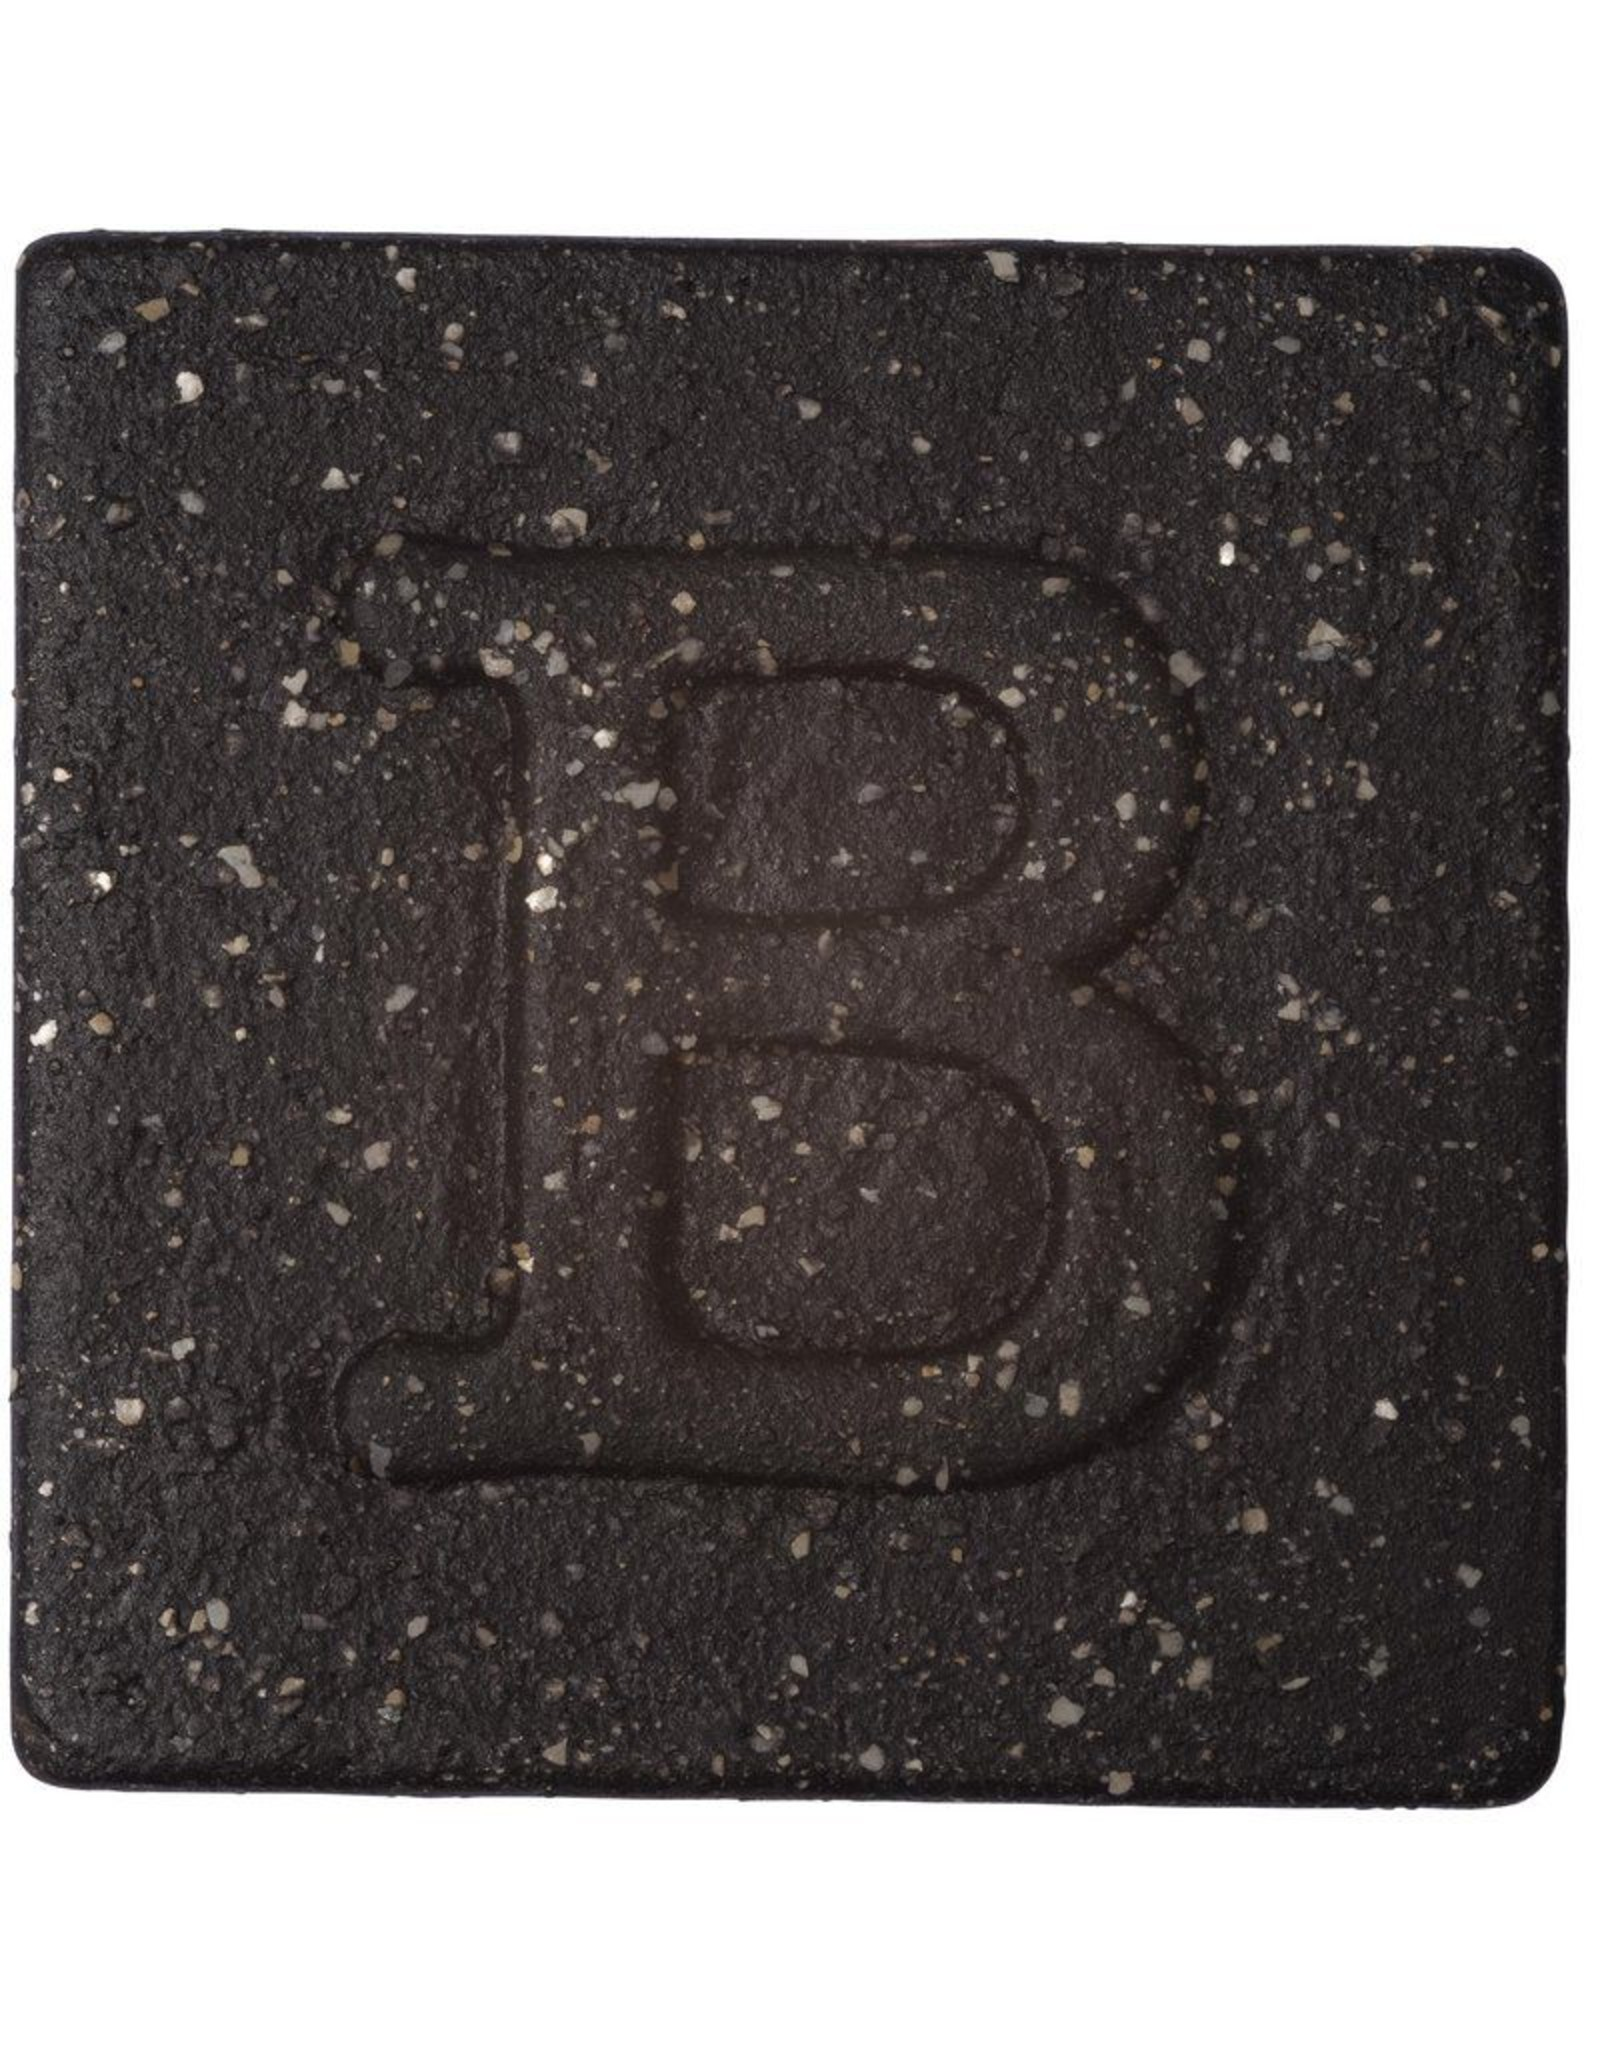 Botz Black Glimmer 200ml